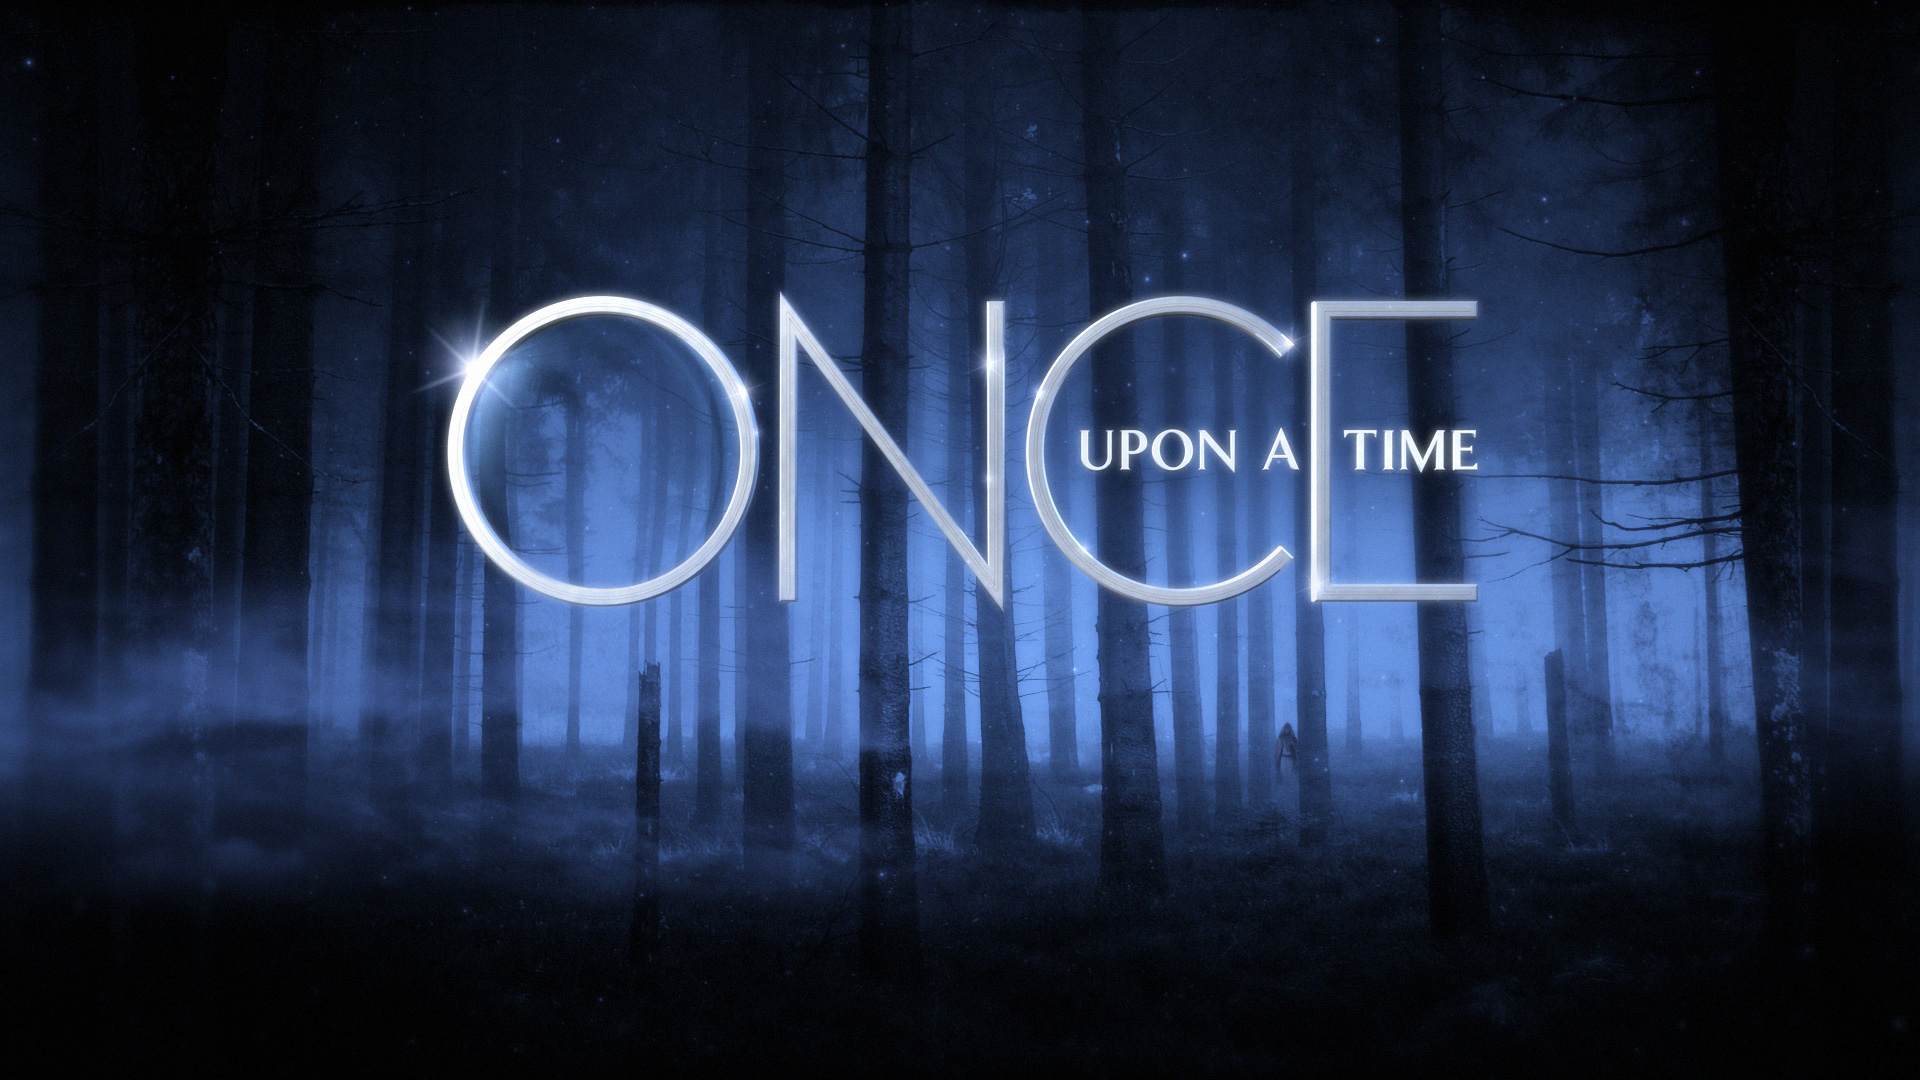 Resultado de imagen para Once upon a time